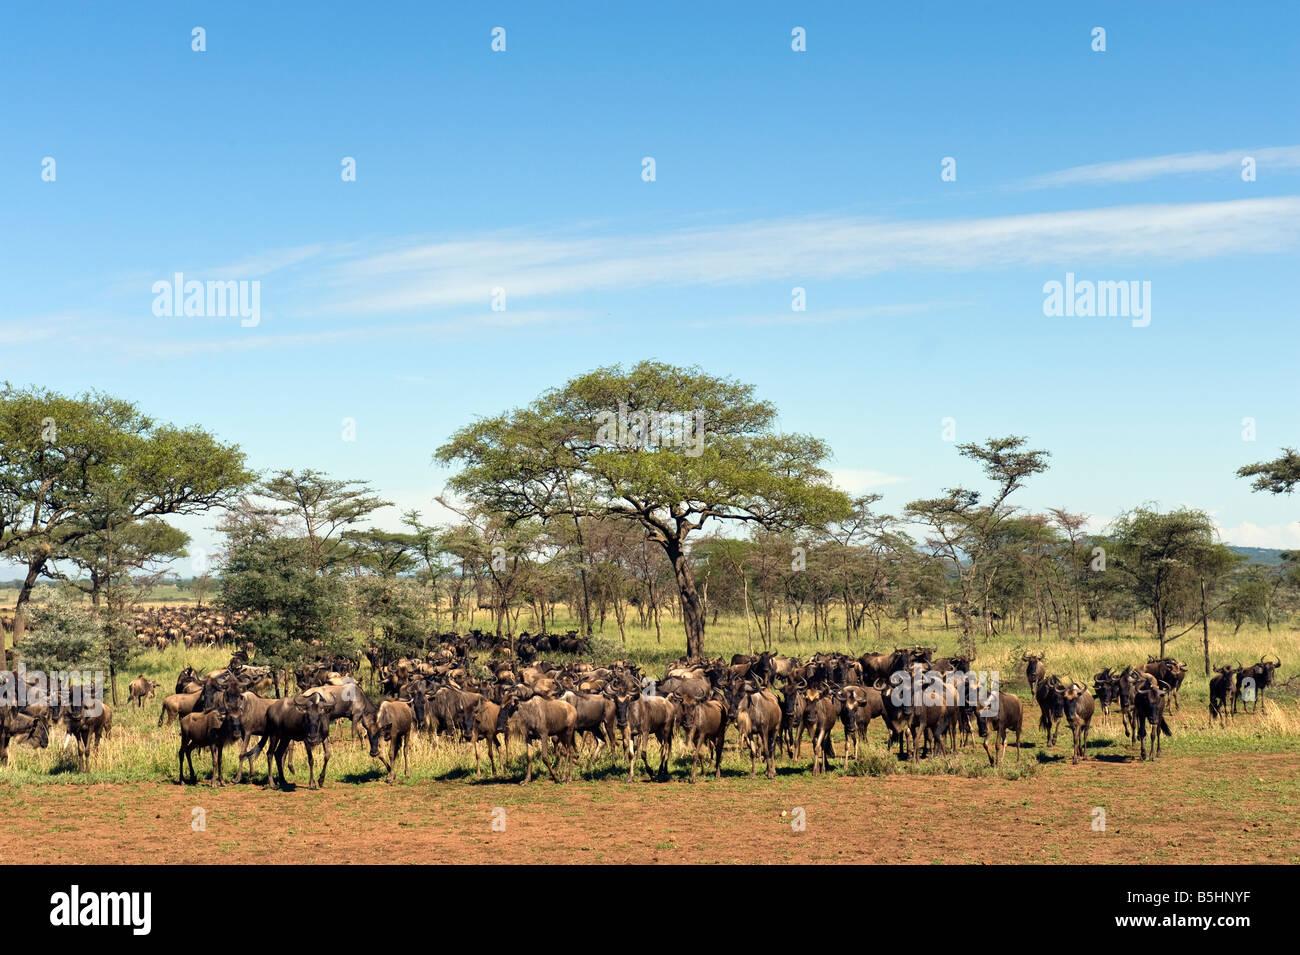 Wildebeest migration (Connochaetes taurinus) on the Musabi plain in Serengeti Tanzania - Stock Image